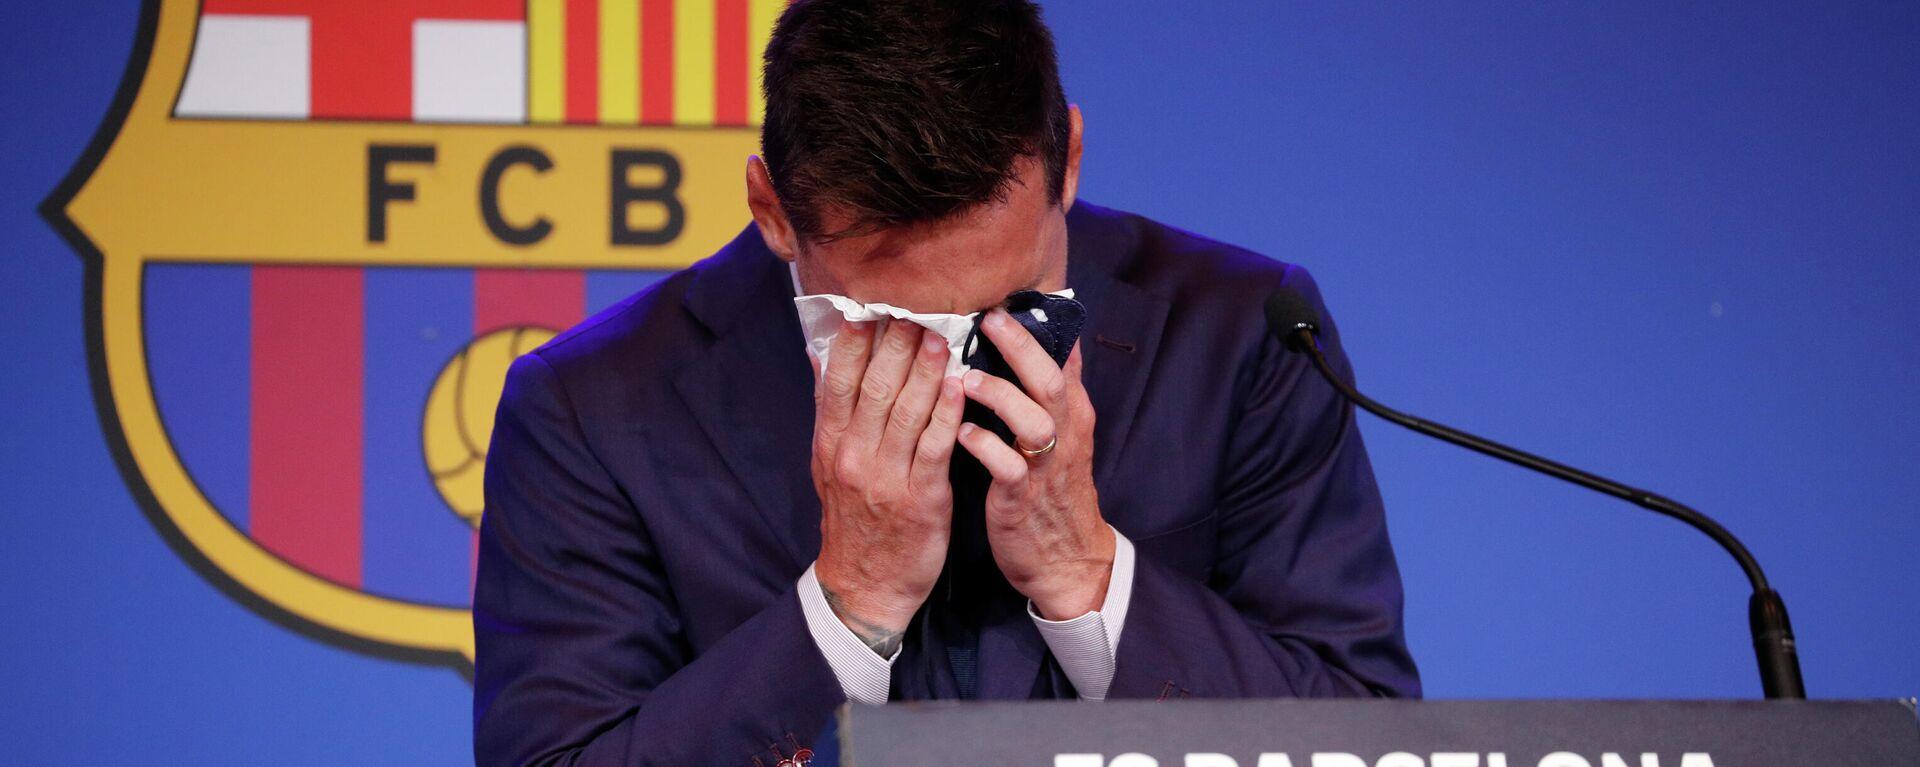 Lionel Messi durante la rueda de prensa tras su salida del FC Barcelona - Sputnik Mundo, 1920, 08.08.2021